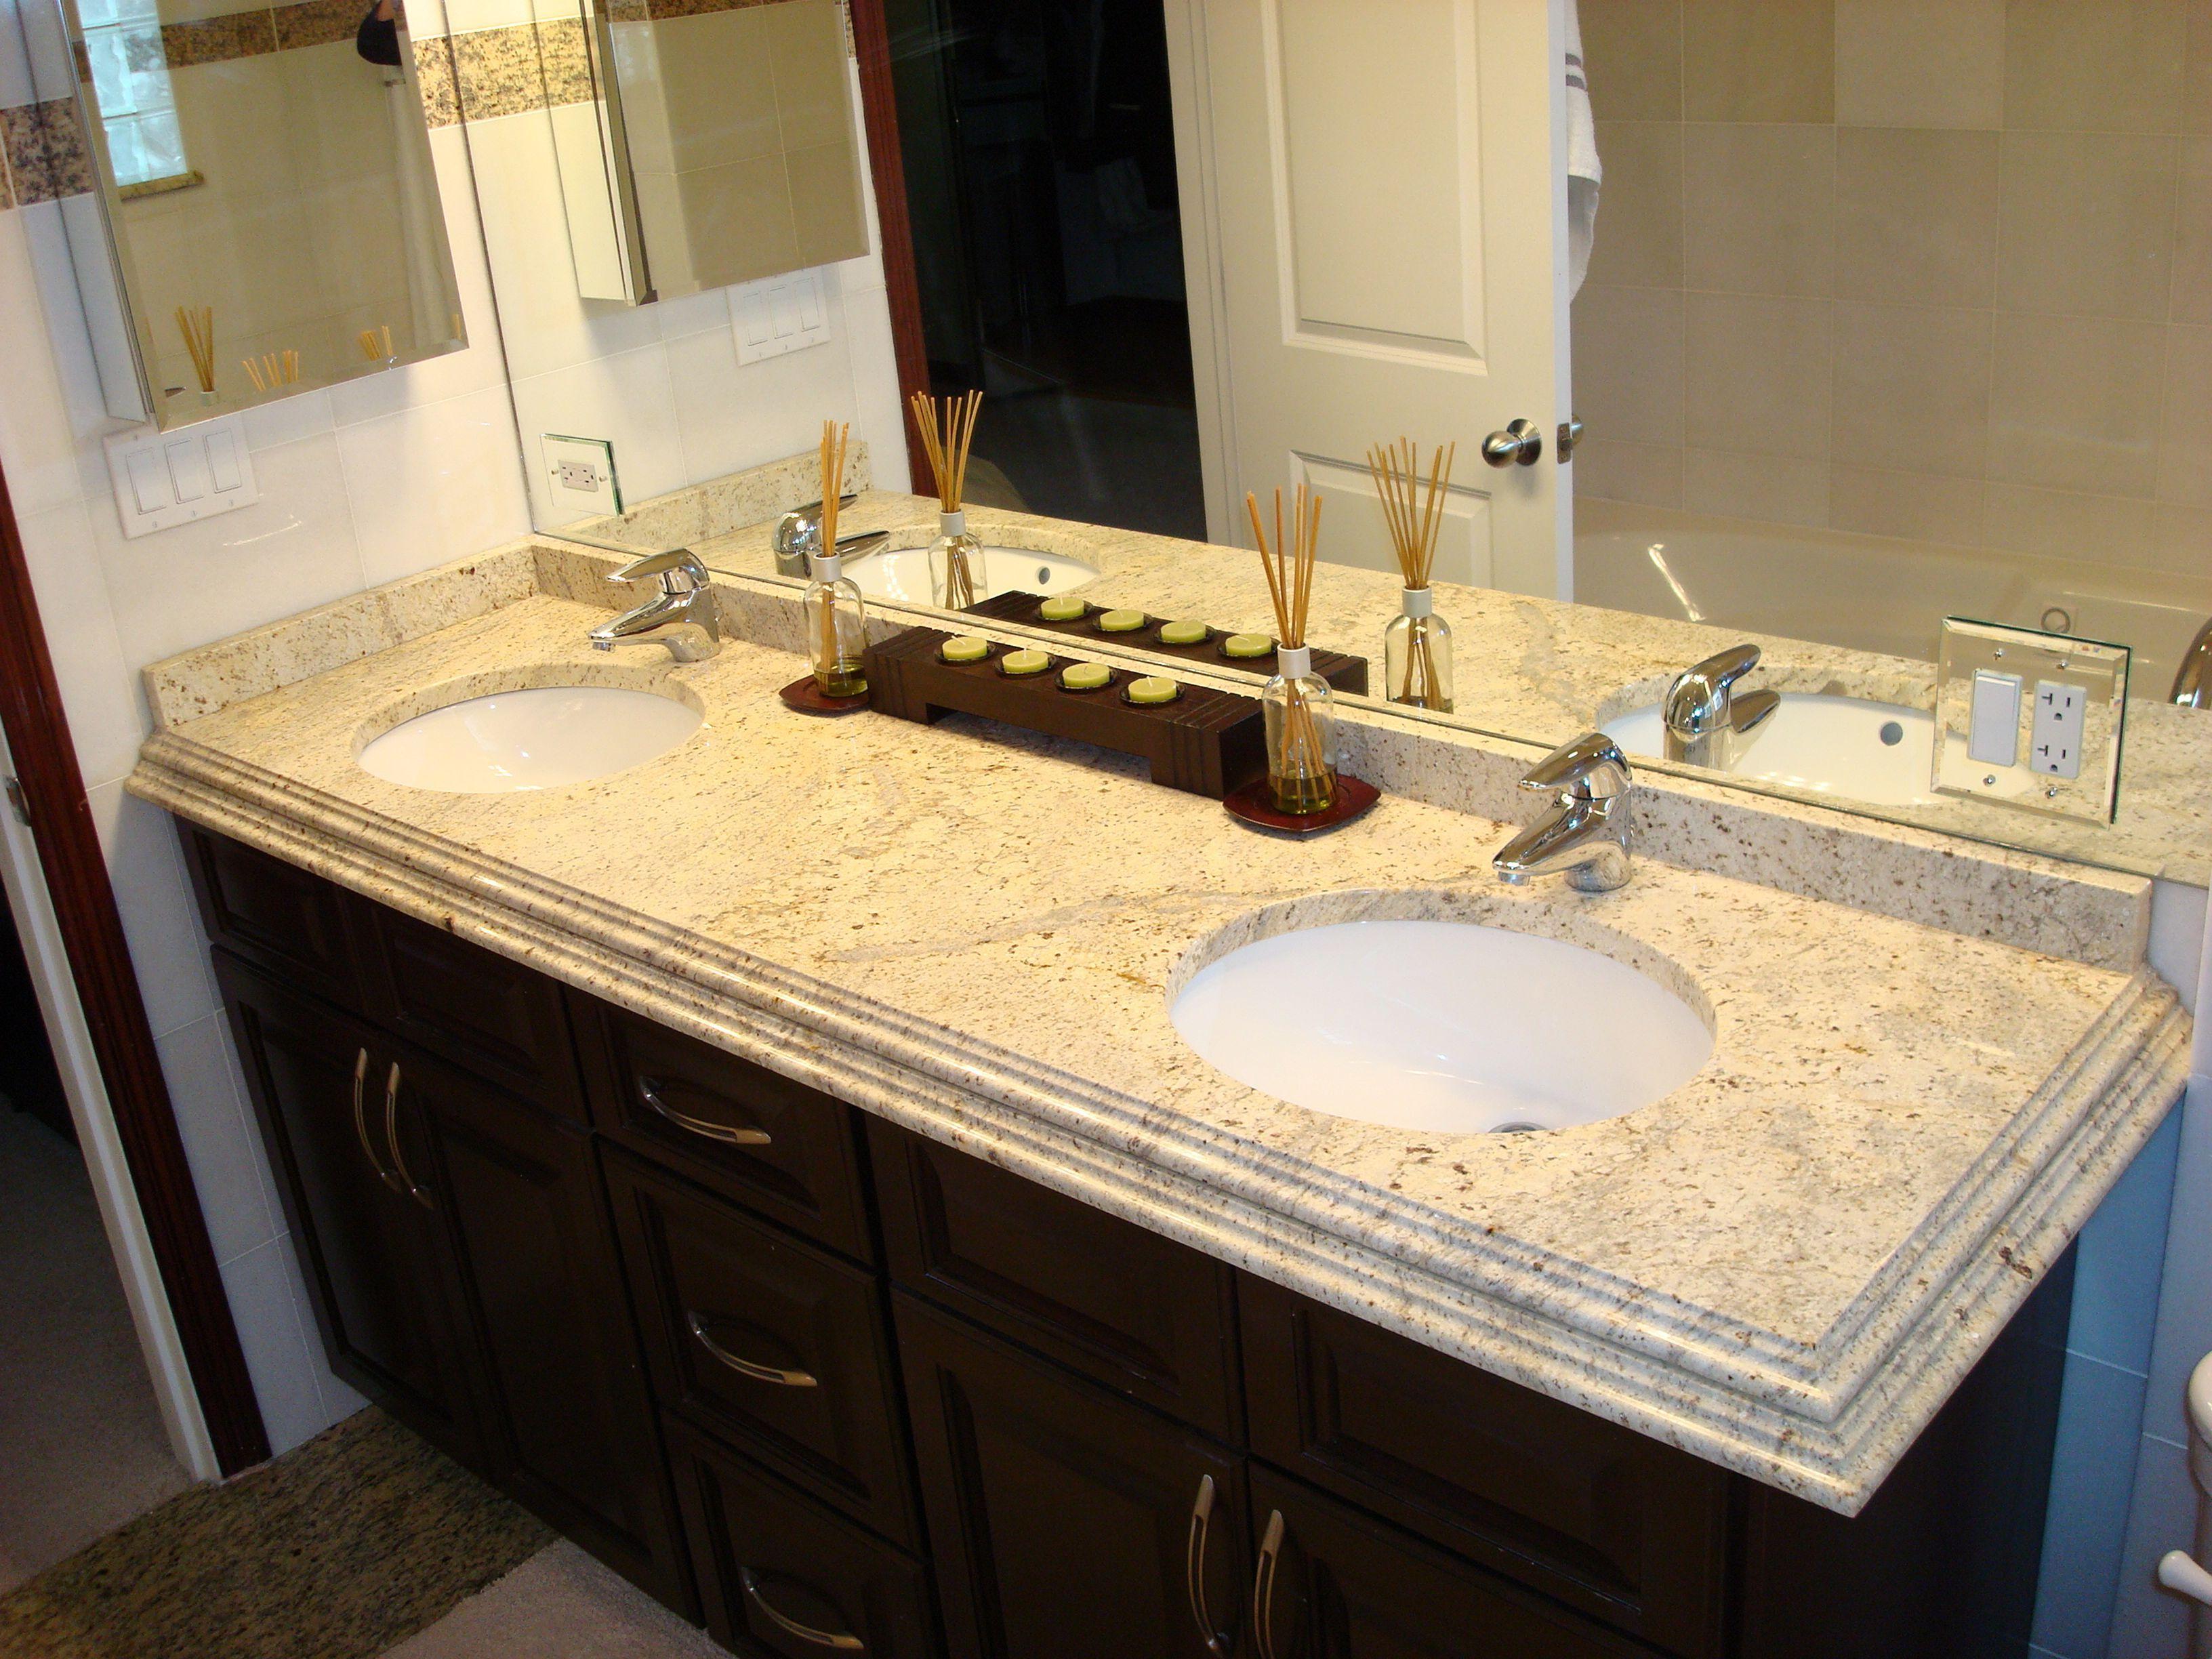 Awe Inspiring 25 Modern Bathroom Countertop Design Trends 2018 Bathroom Interior Design Ideas Clesiryabchikinfo